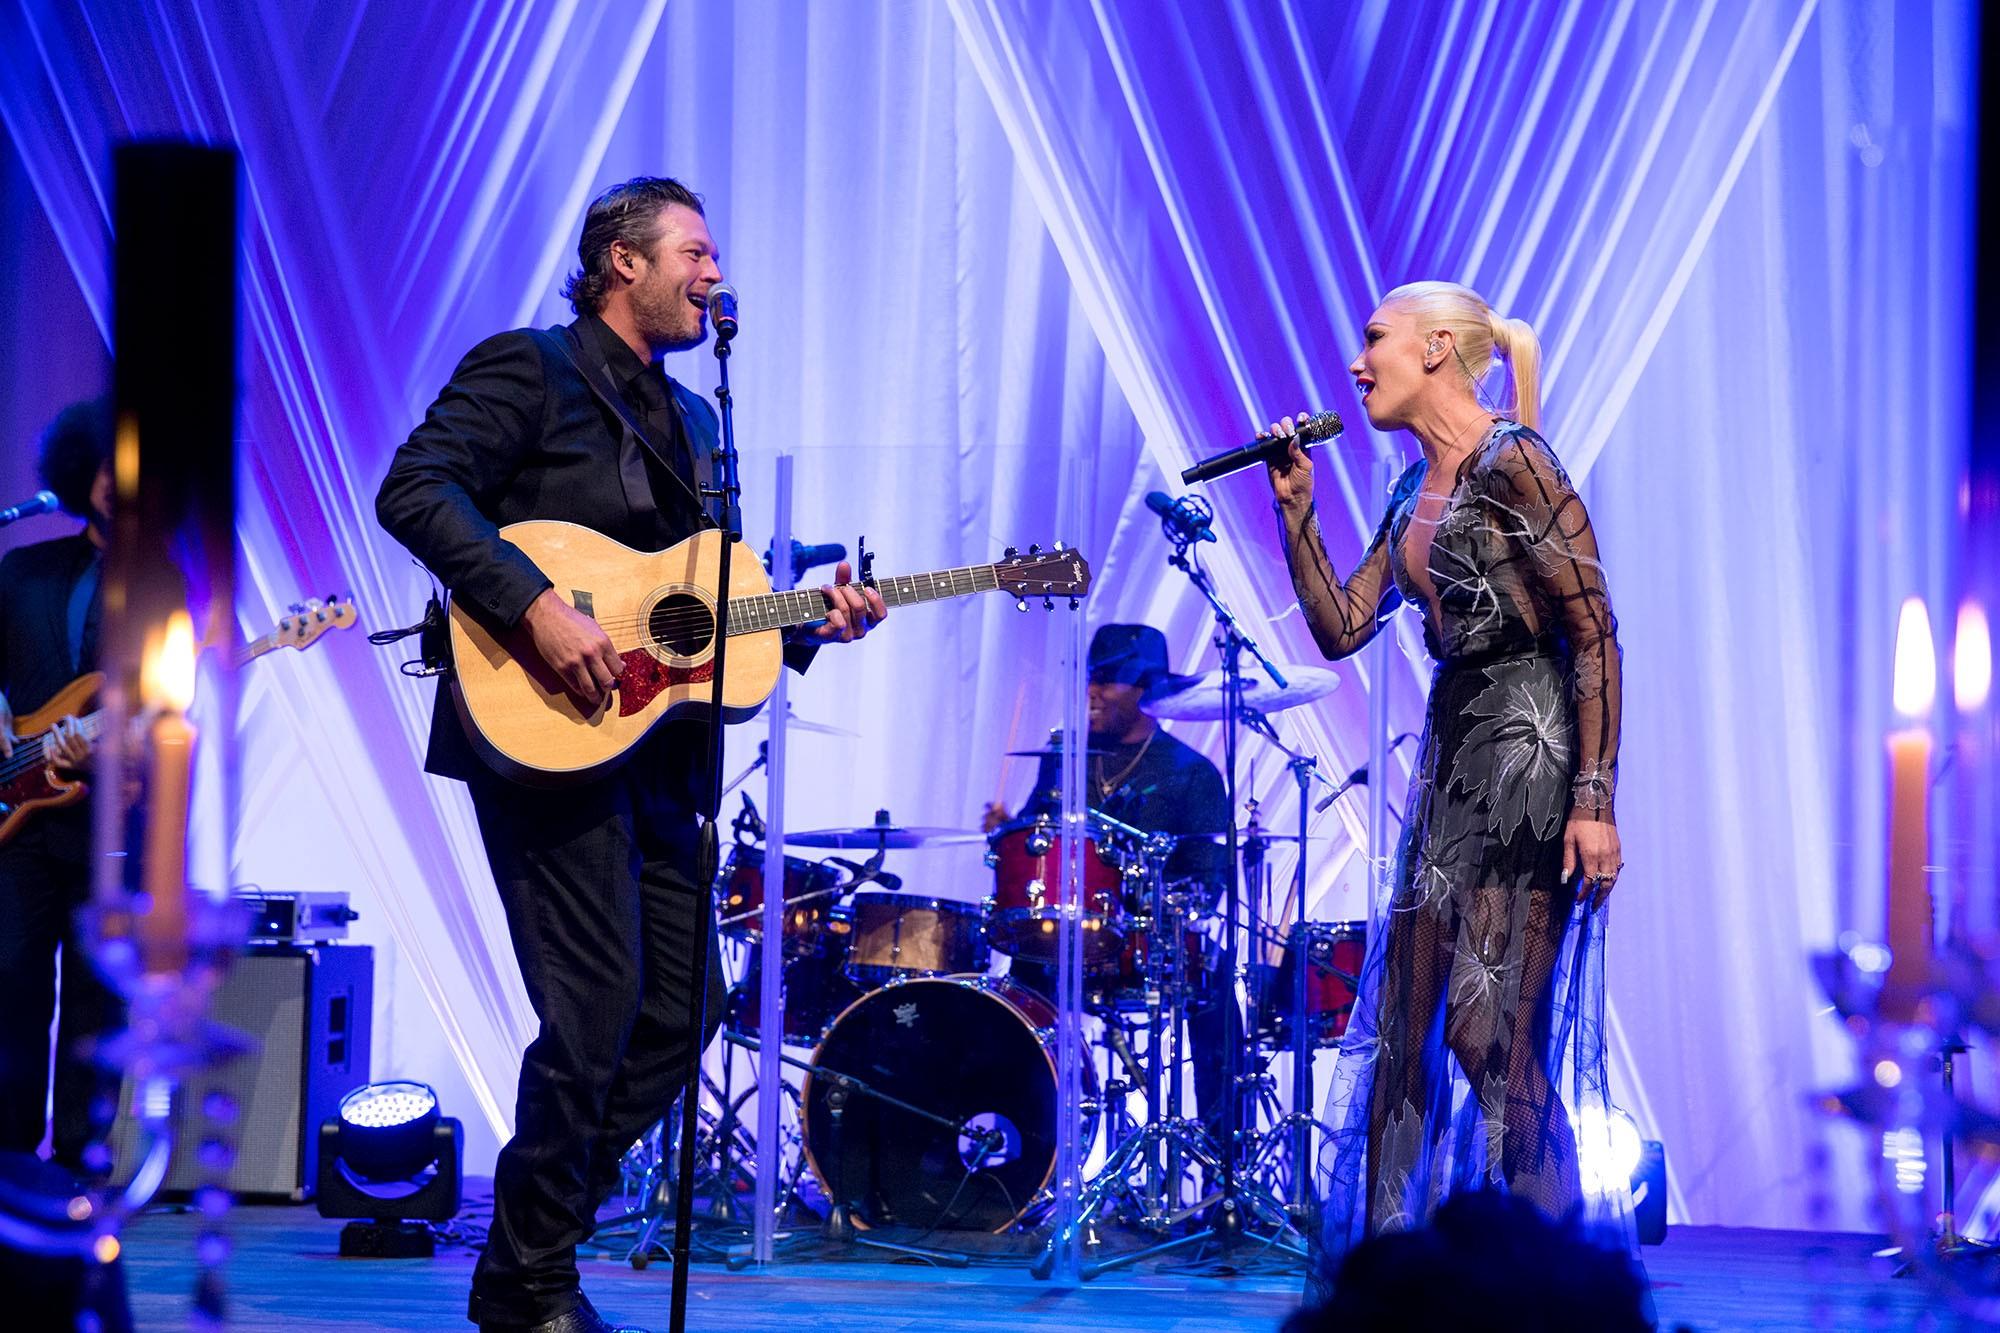 Blake Shelton and Gwen Stefani performing together. Photo: Wikimedia Commons.